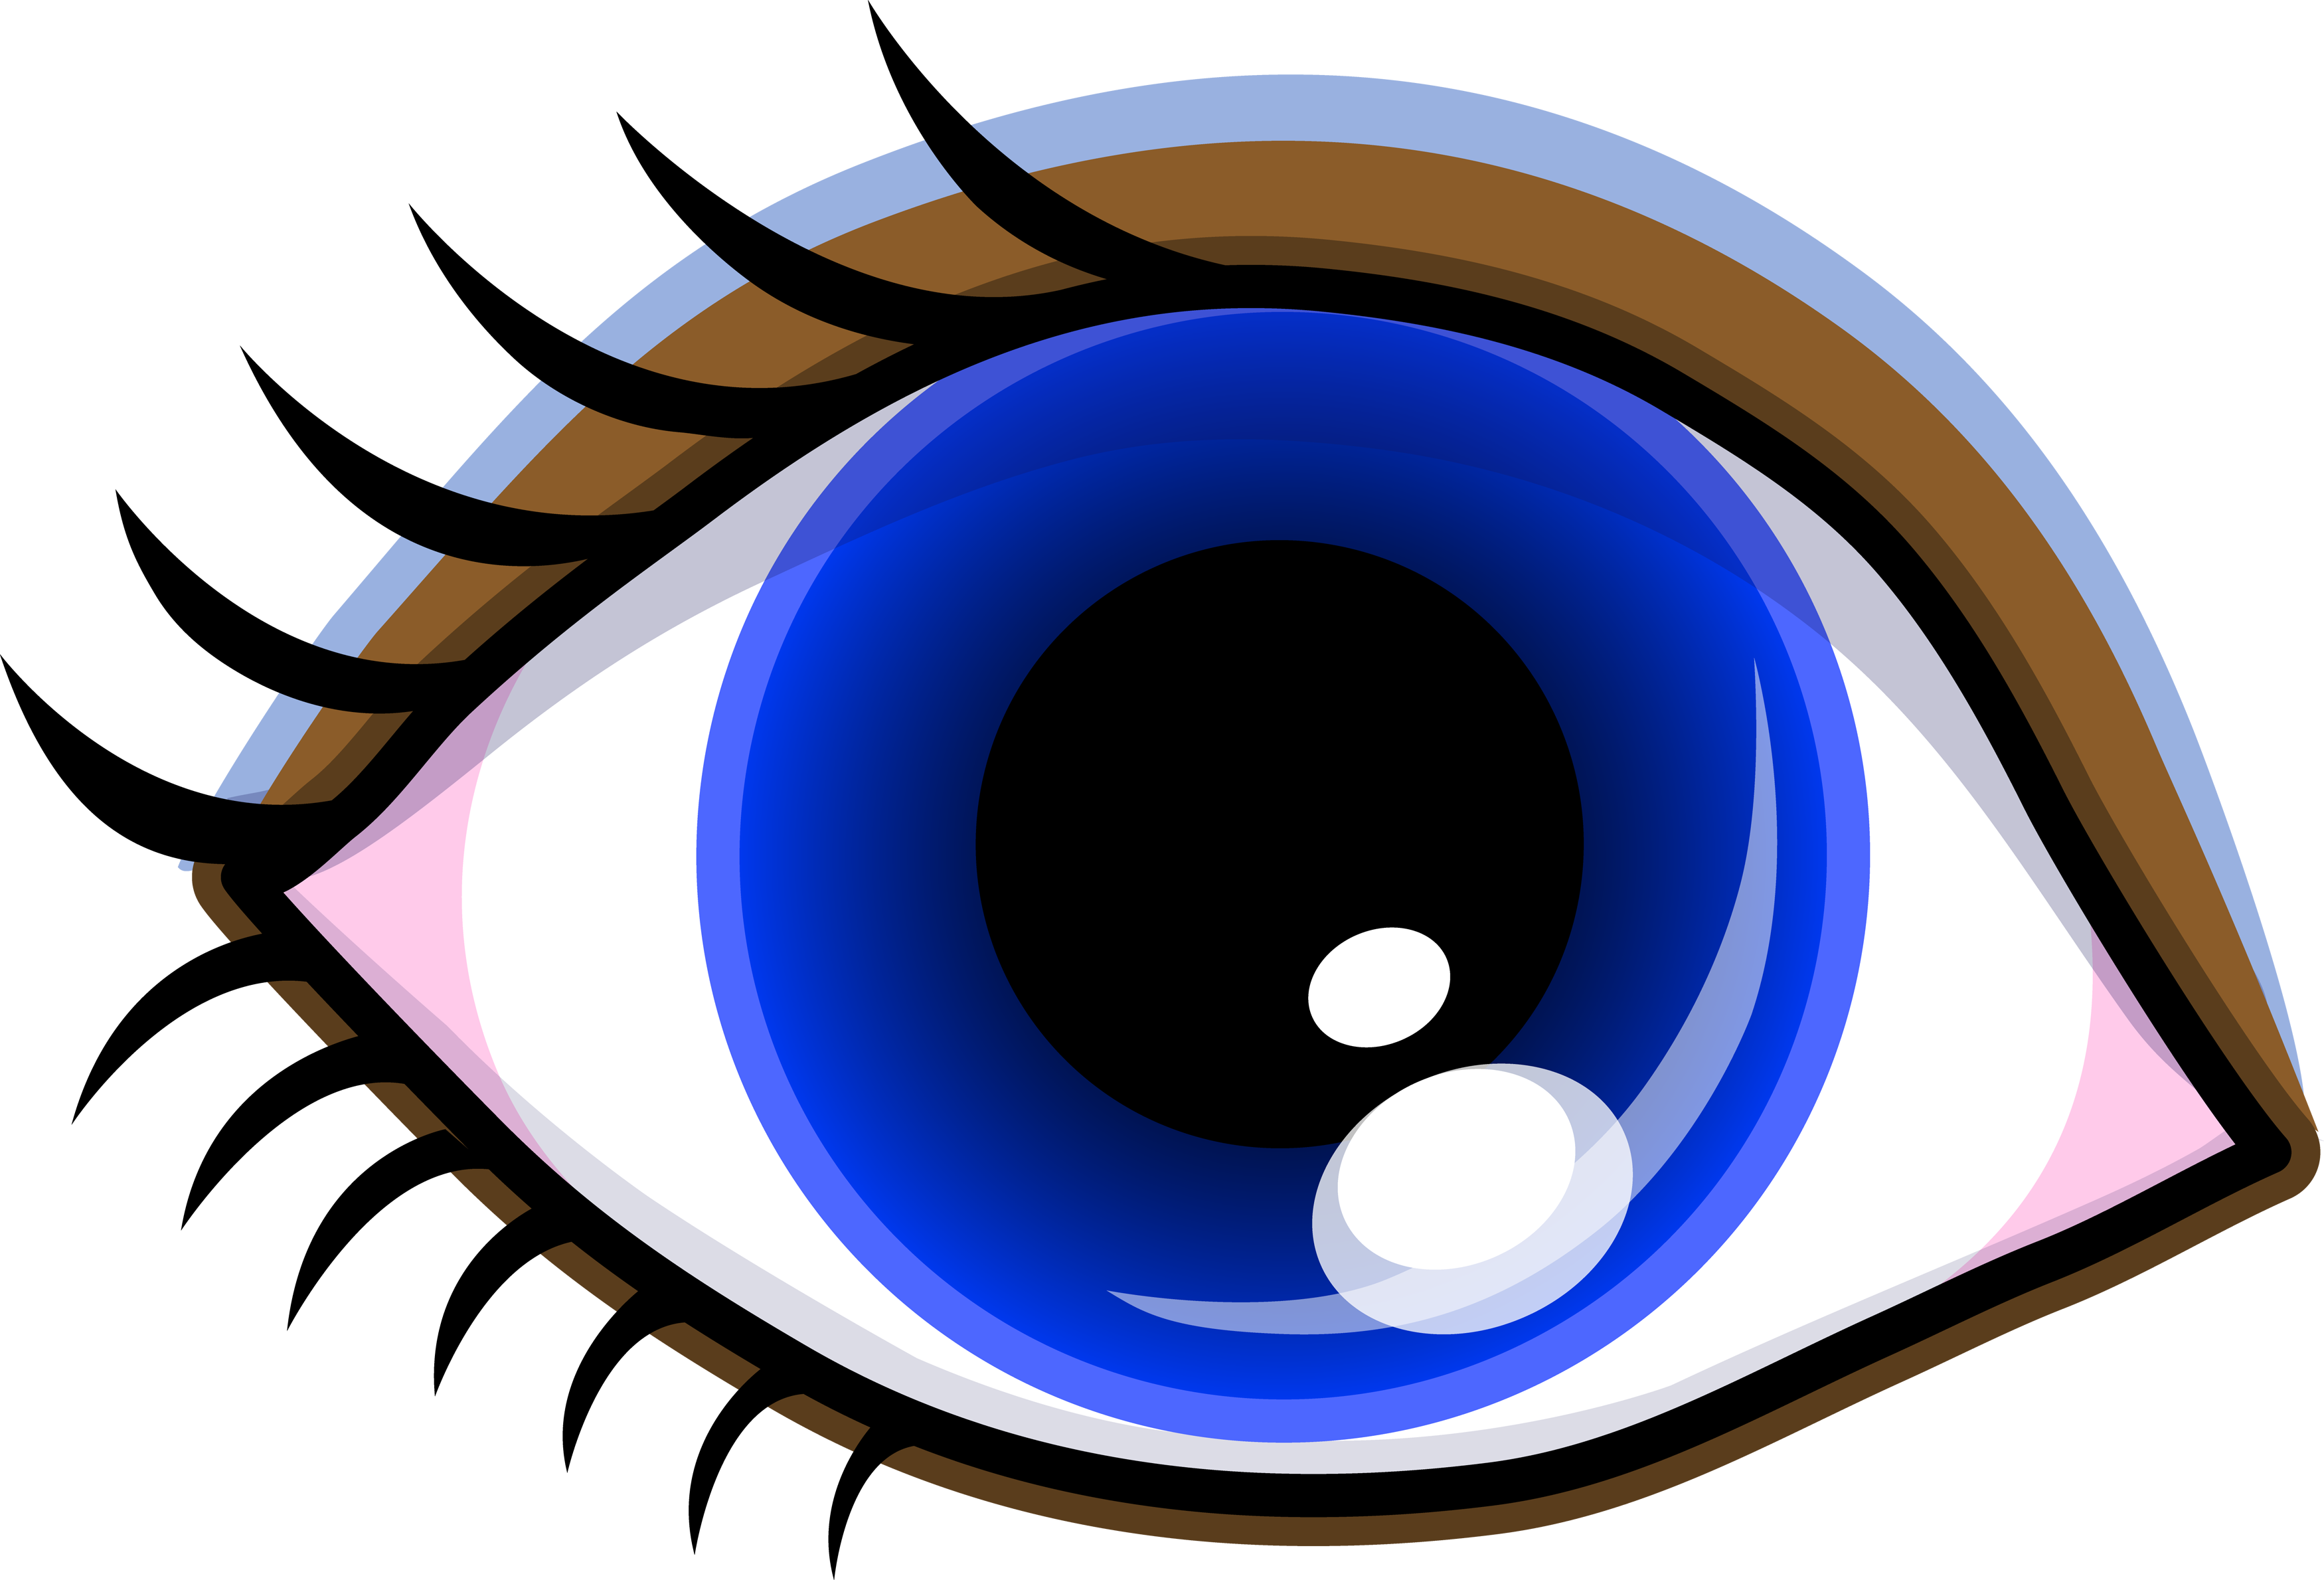 clipart bat eye